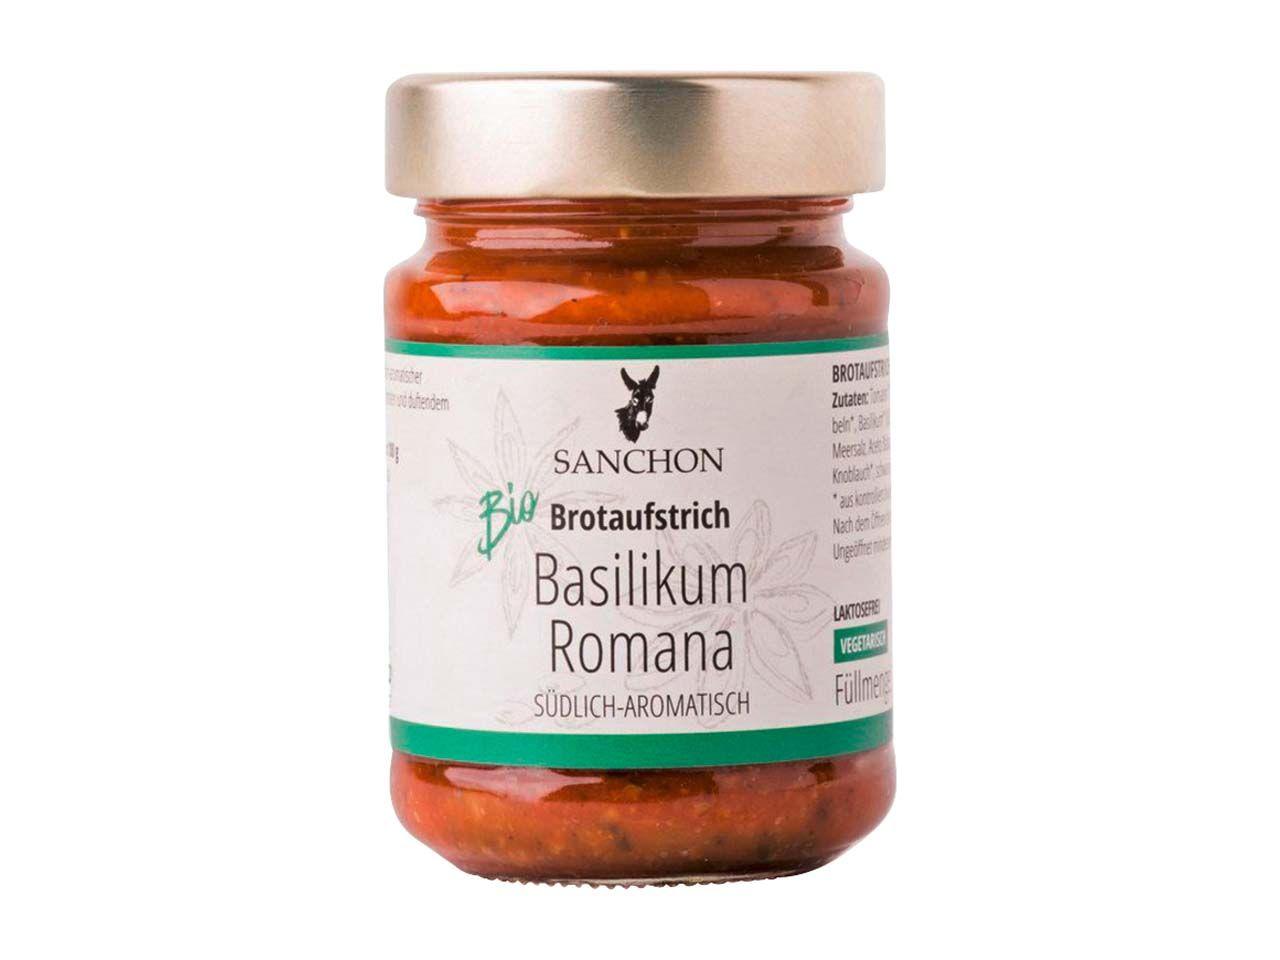 "SANCHON Bio-Brotaufstrich ""Basilikum Romana"" 190 g 1300010"